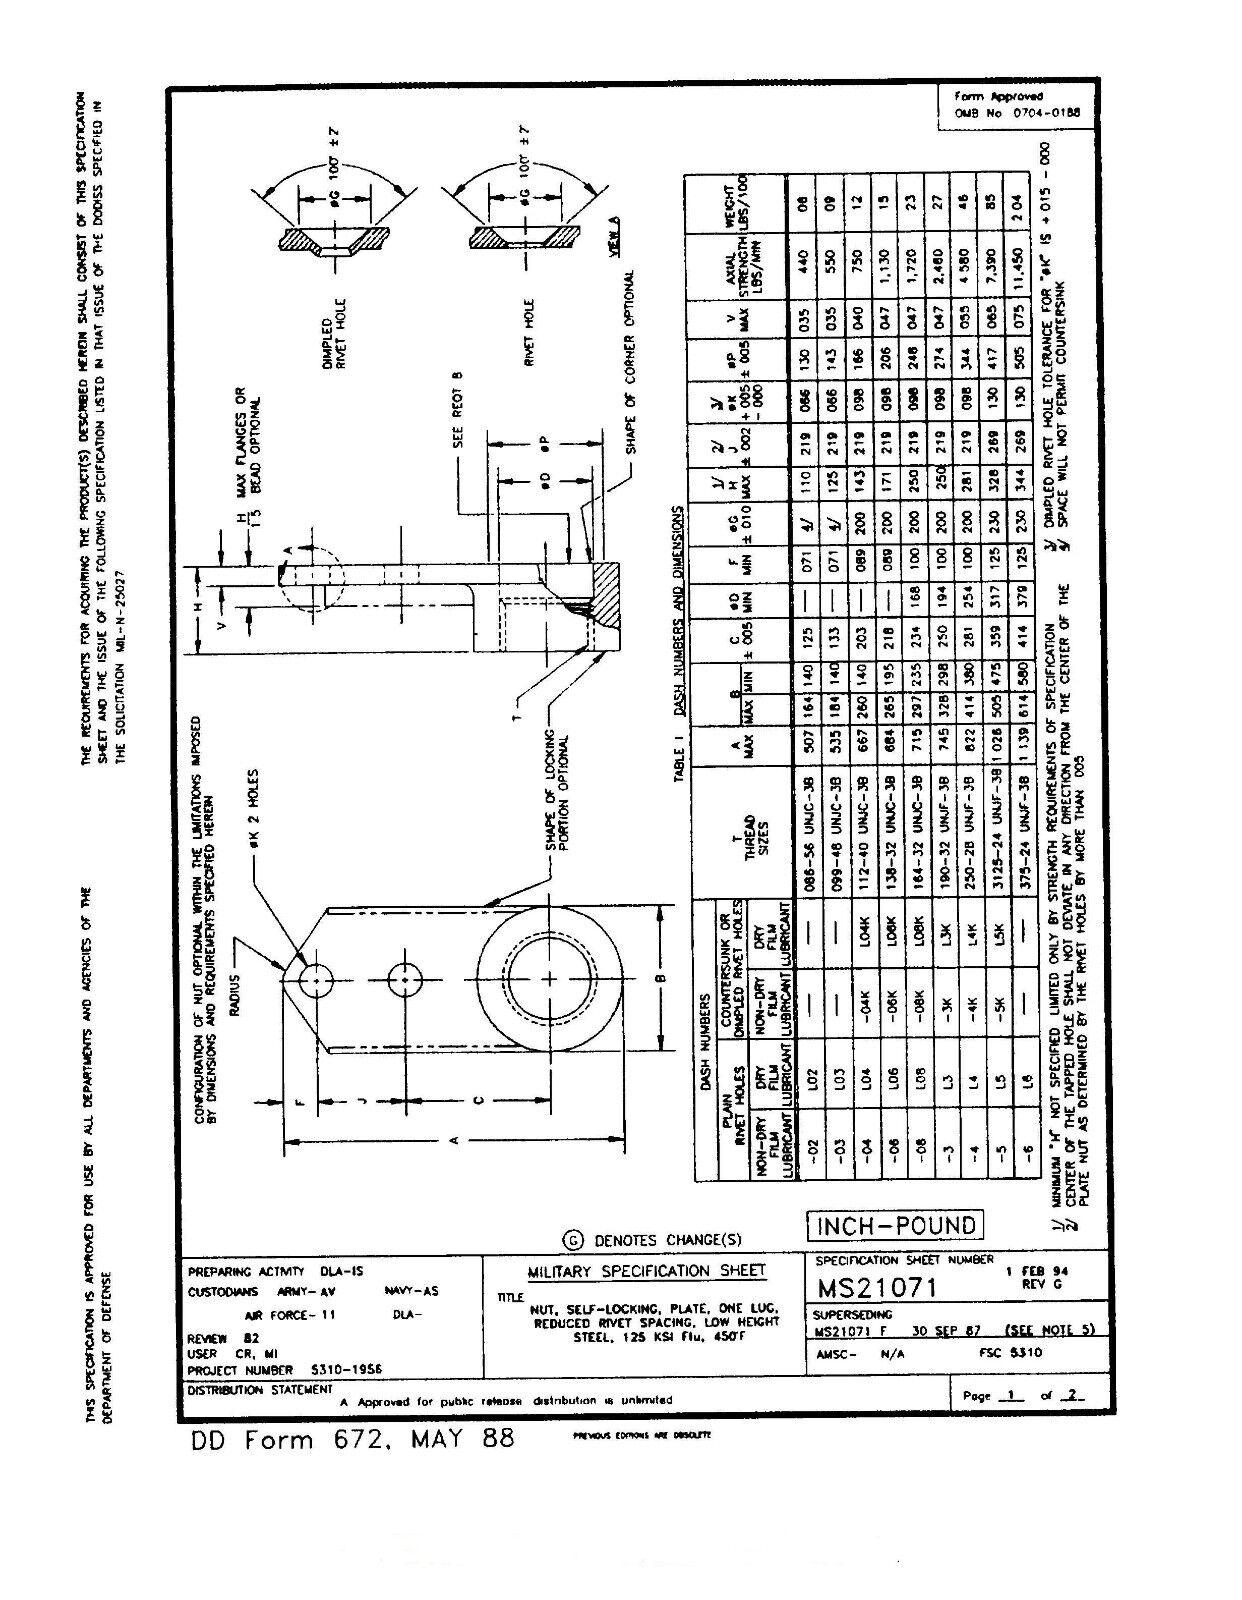 MS21071-04 NAS696X04L NUT 1 LUG REDUCED RIVET  STEEL CAD PLATE  SIZE 4-40 25/PK